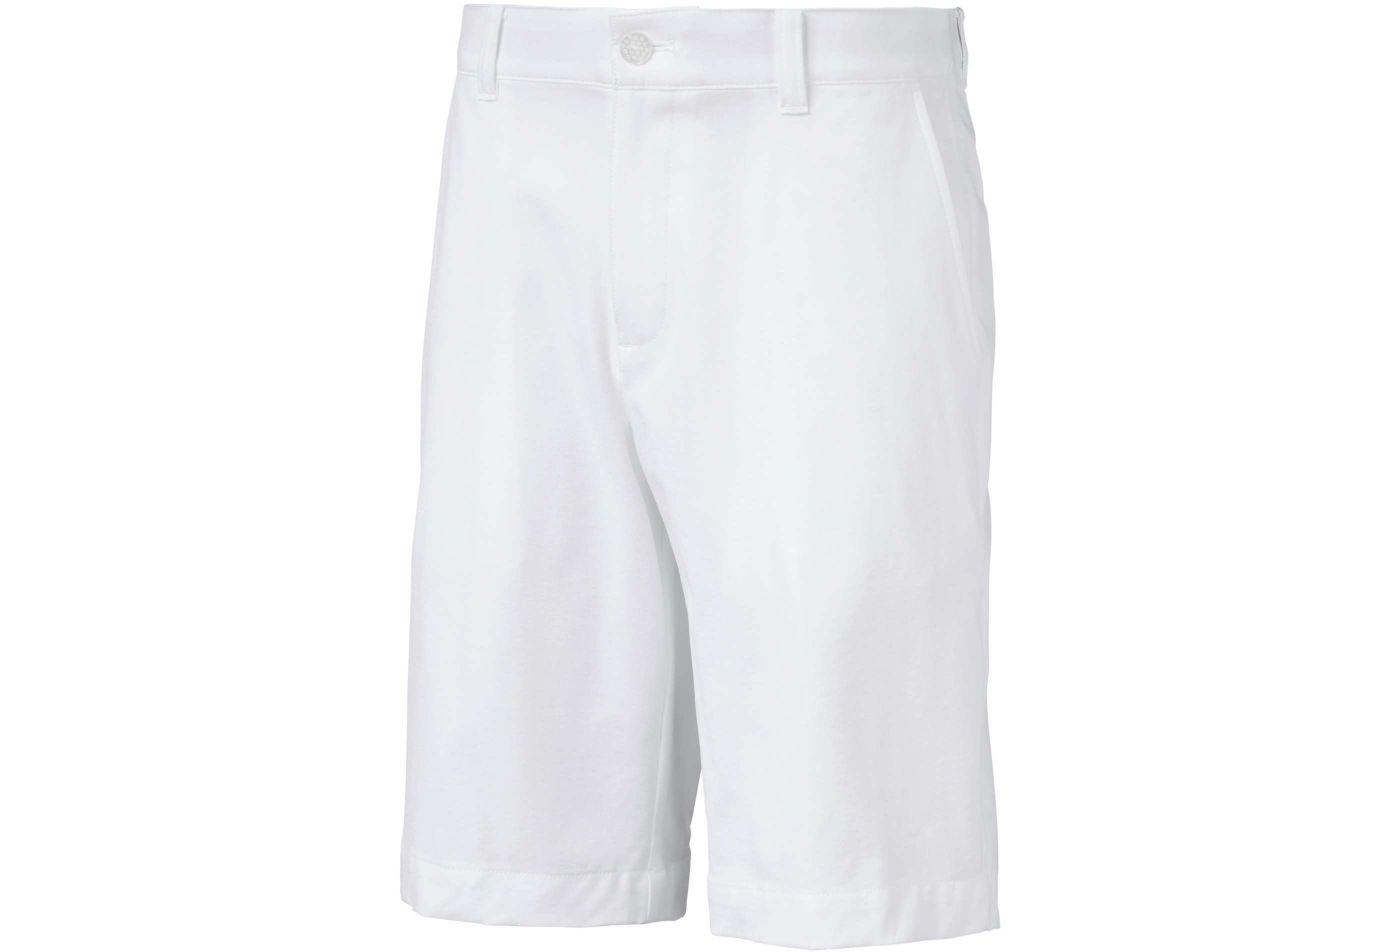 PUMA Boys' Heather Pounce Jr Golf Shorts